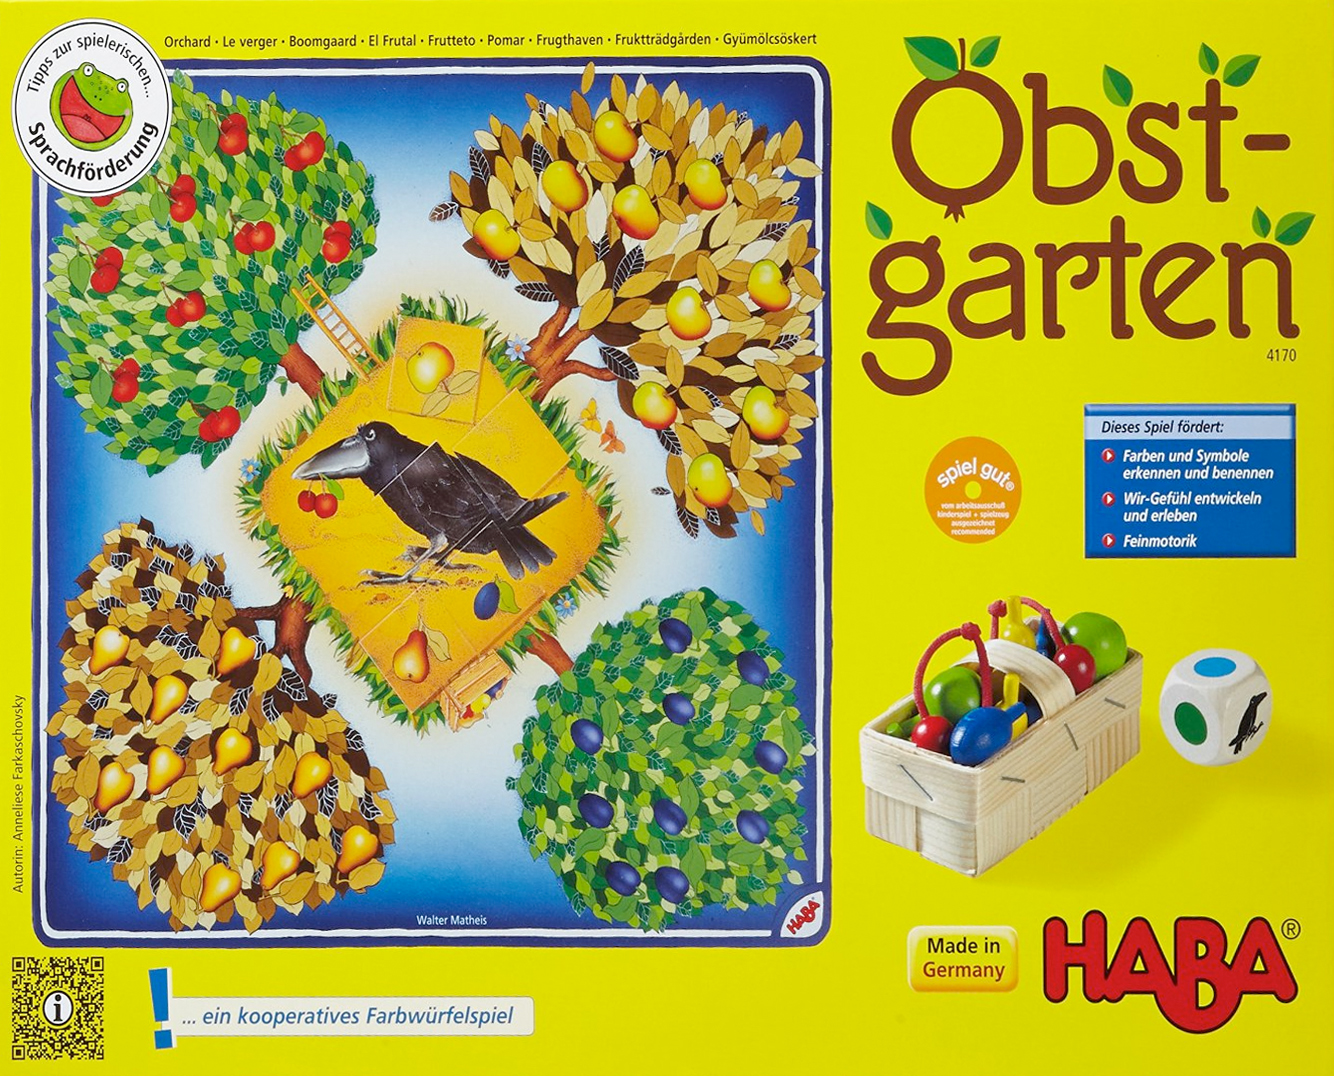 Erster Obstgarten Anleitung